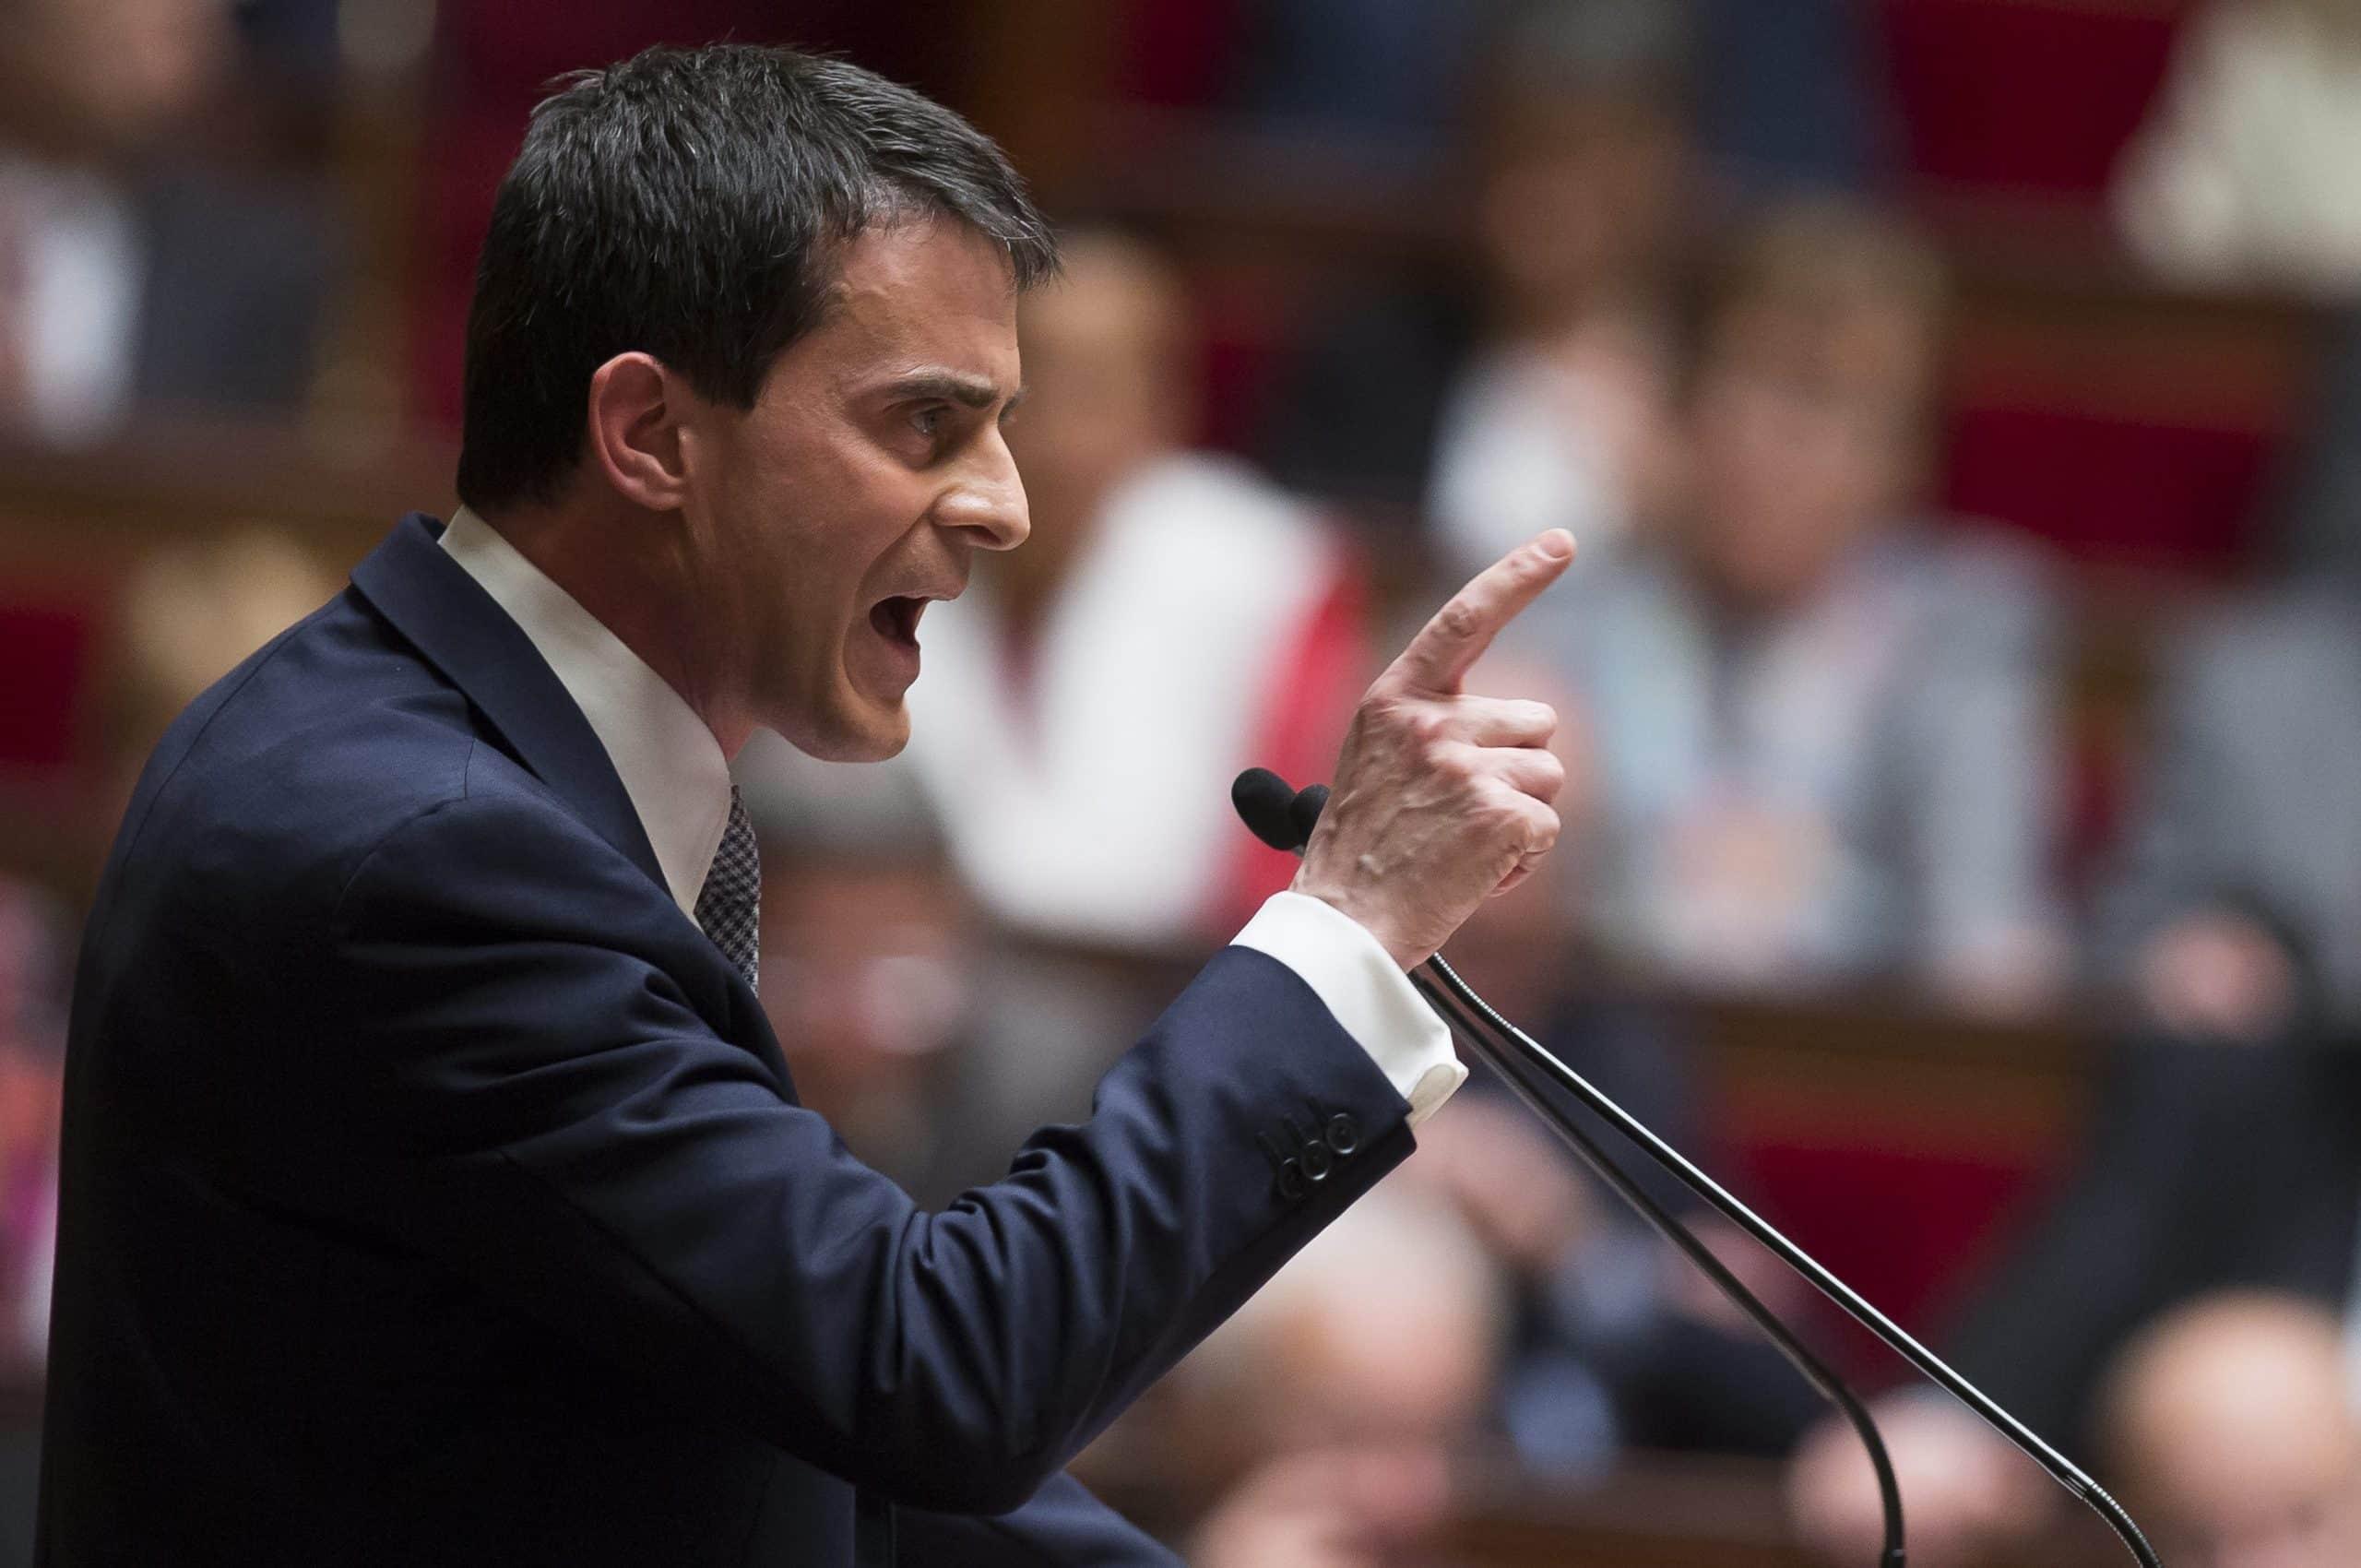 Manuel Valls est islamophobe